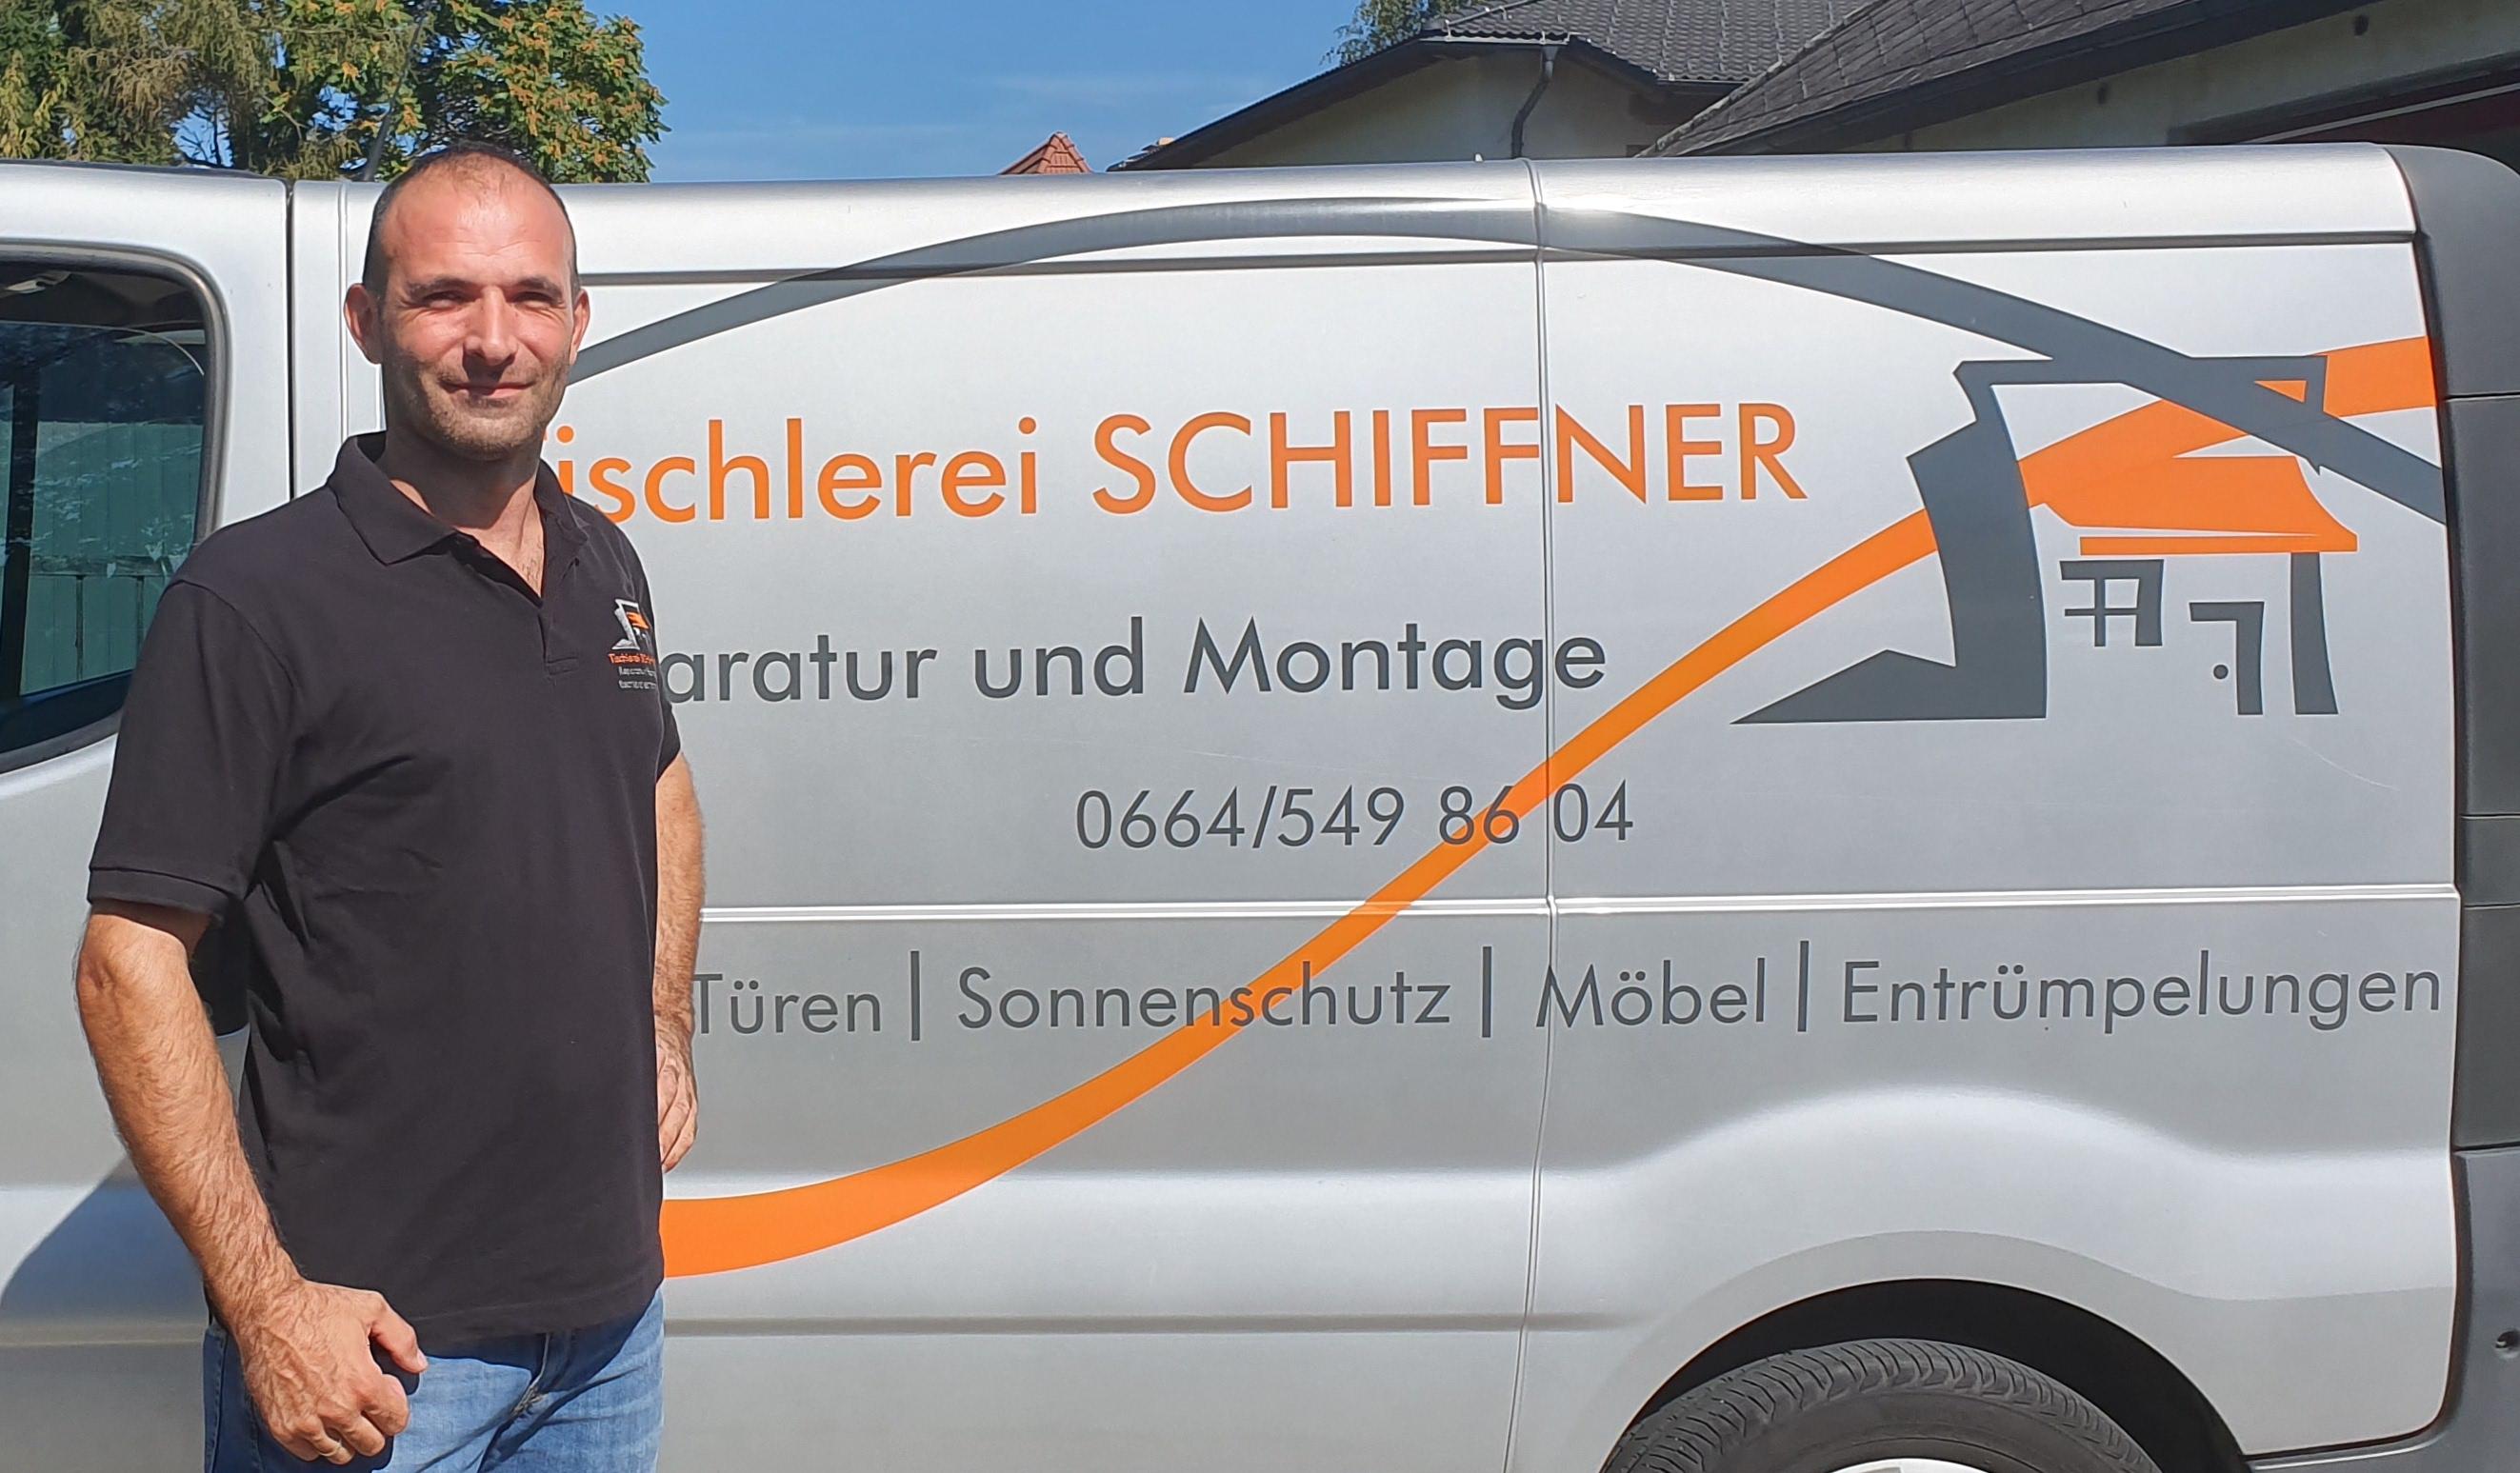 tischlereischiffner-jörgschiffner-teamfoto